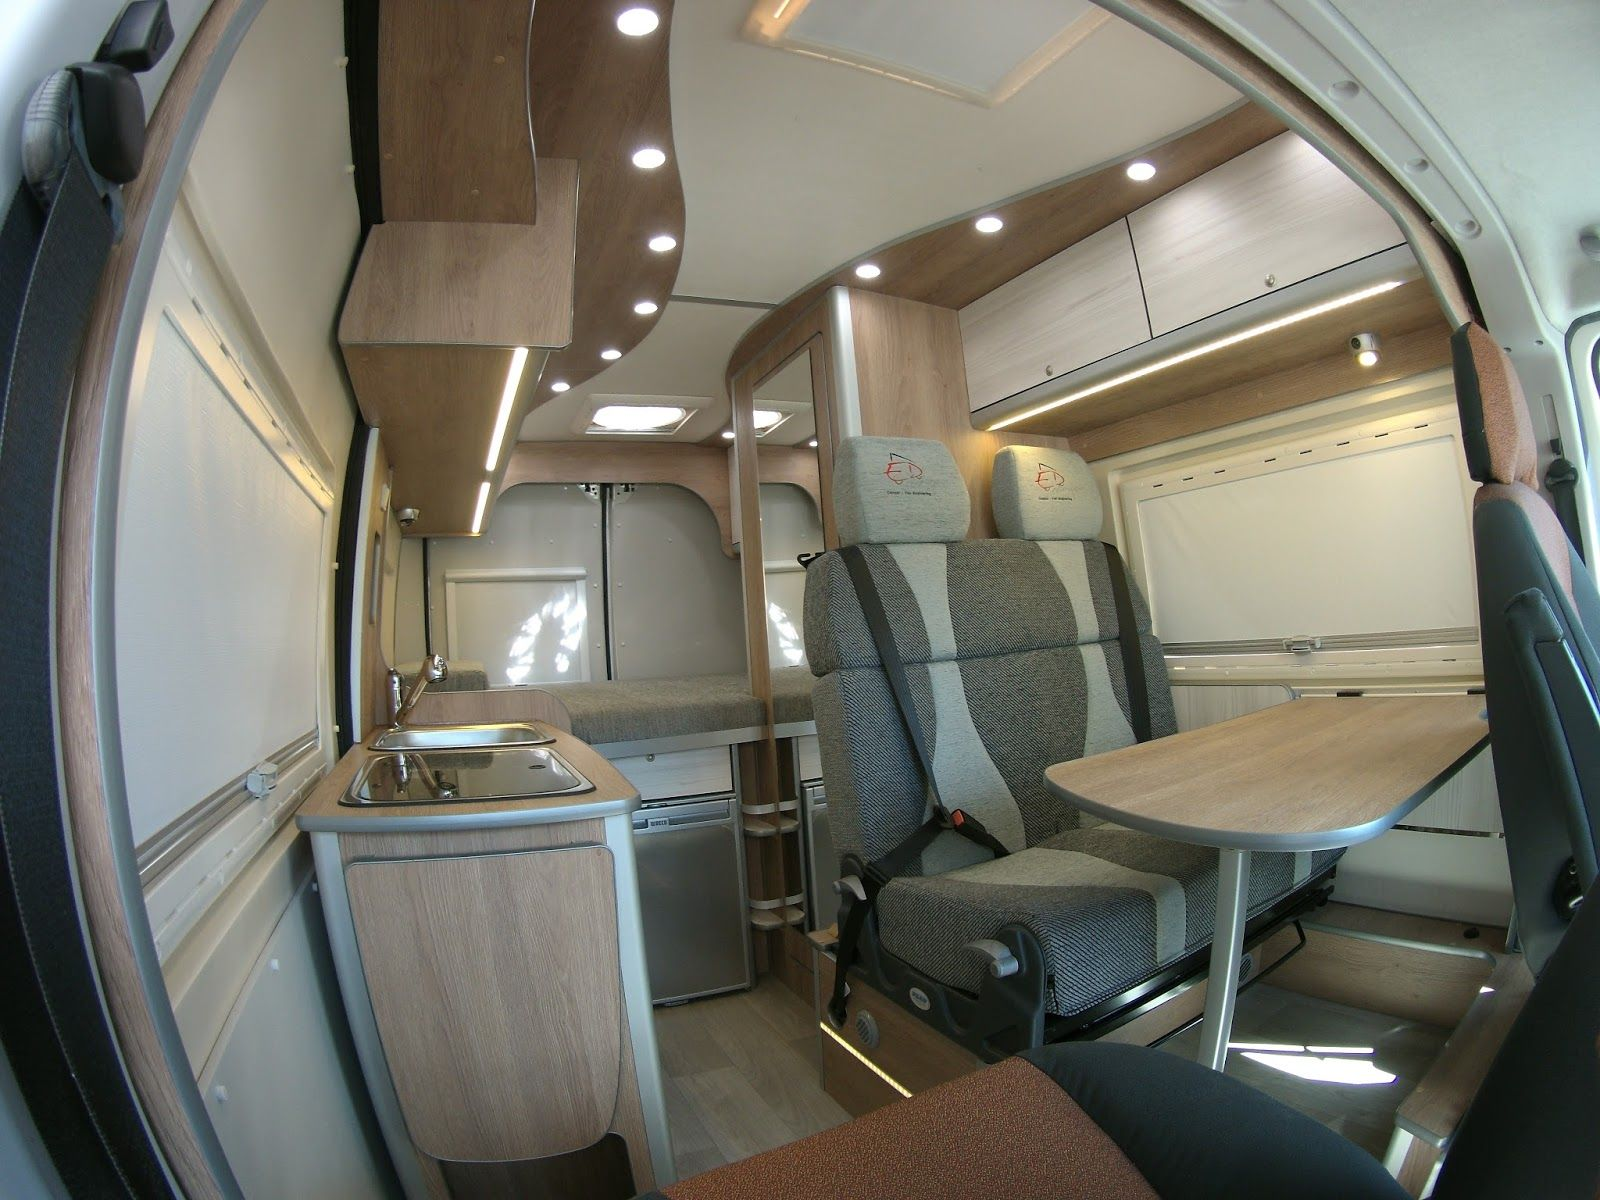 fiat ducato l2h2 4 plazas viaje 4 noche camper. Black Bedroom Furniture Sets. Home Design Ideas